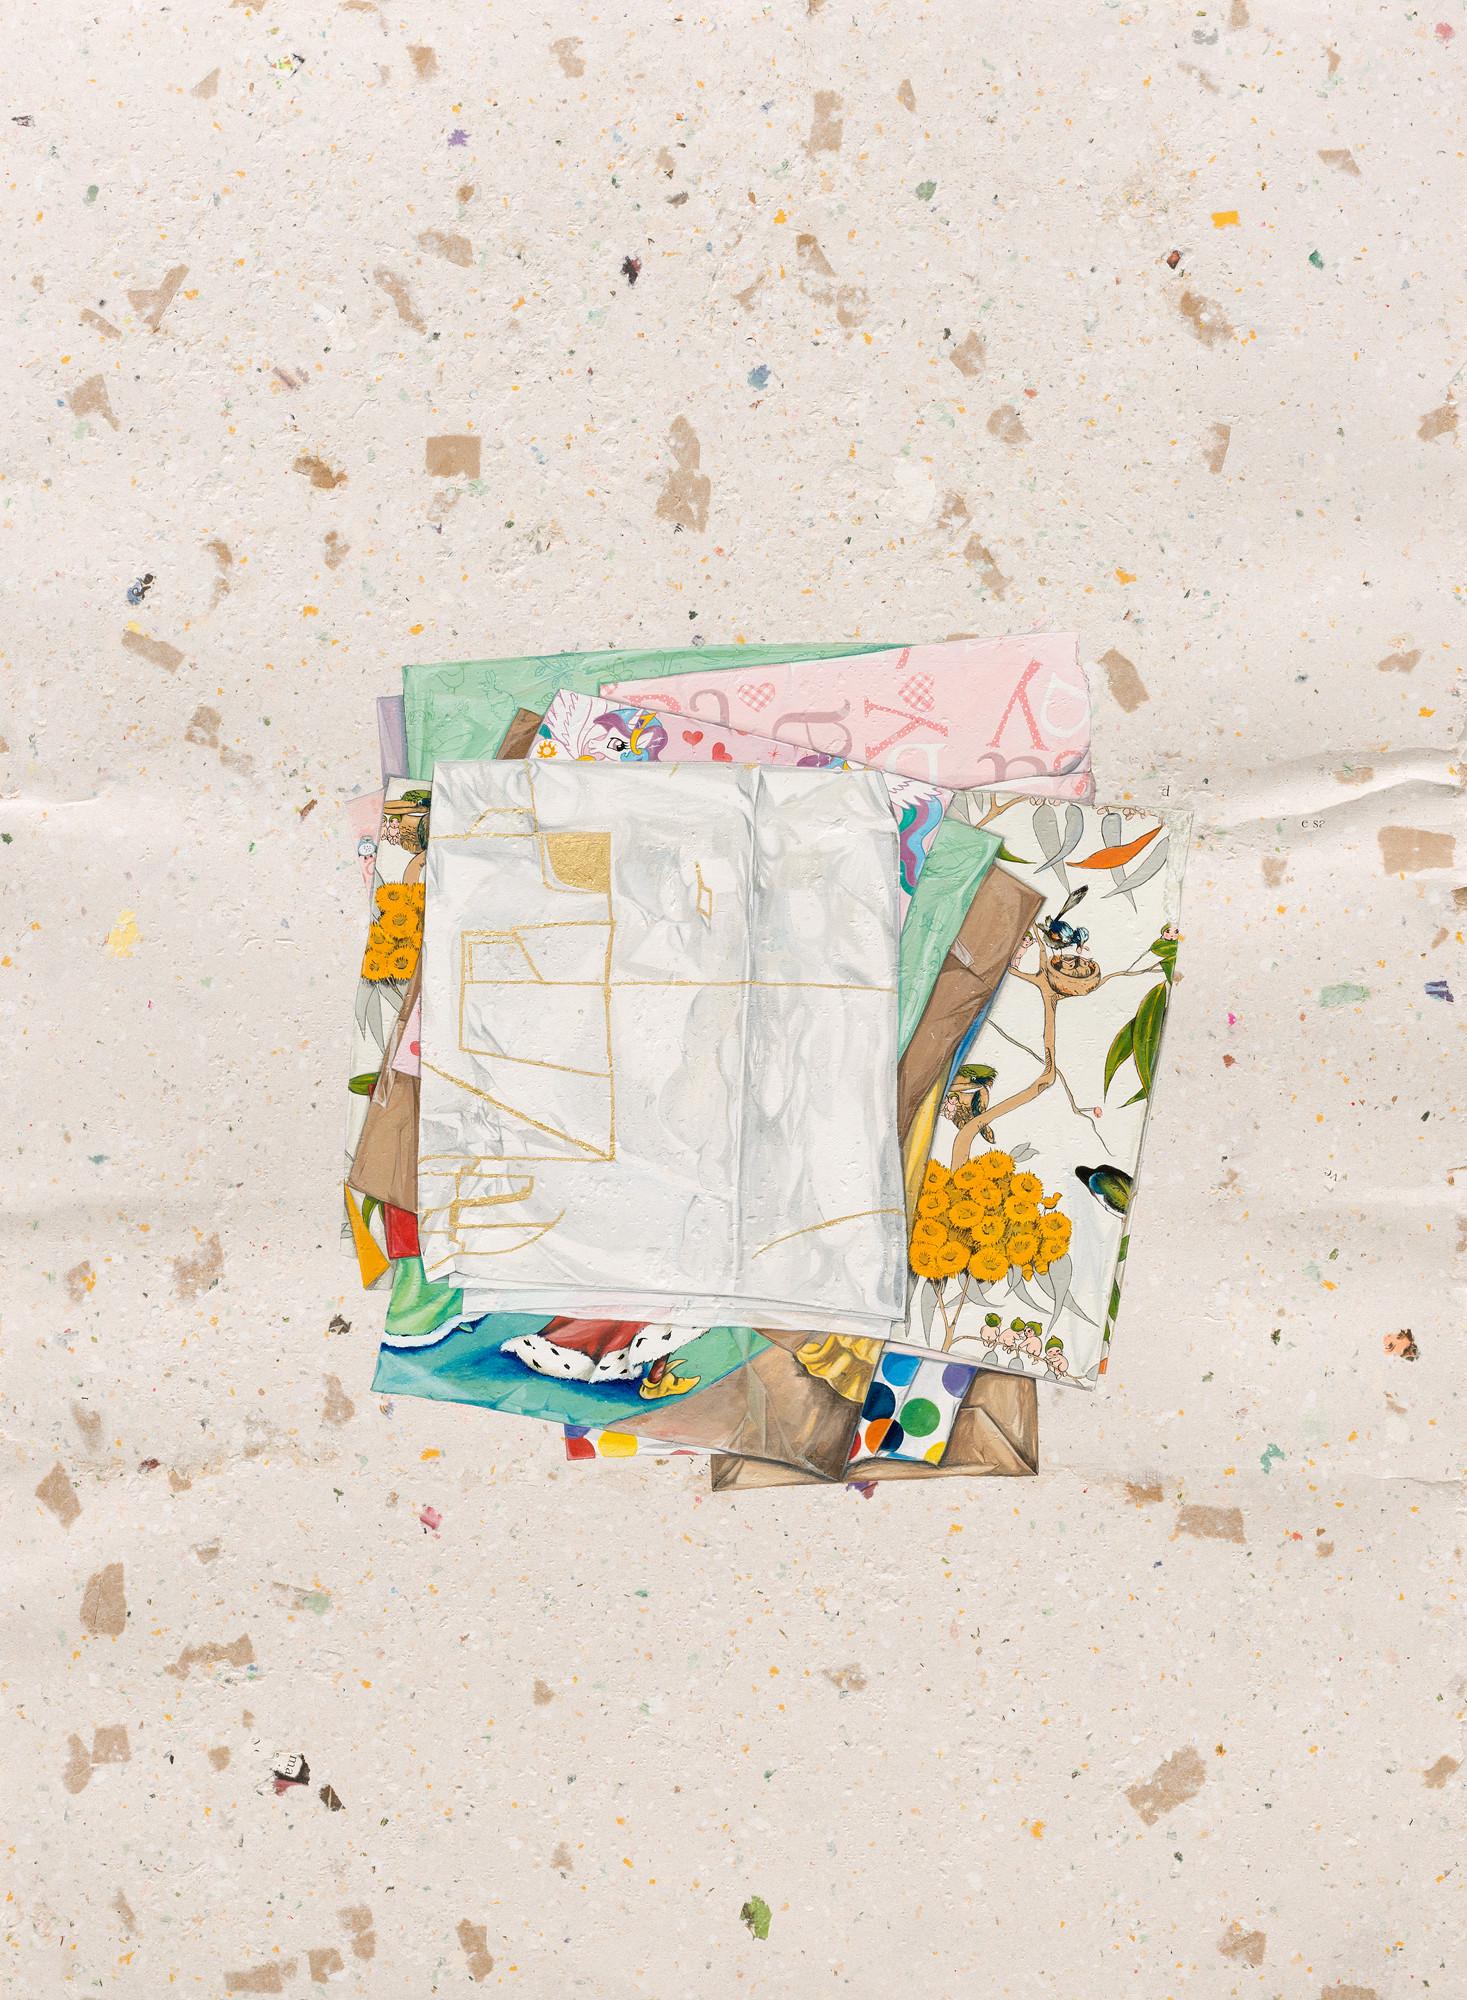 <span class=&#34;link fancybox-details-link&#34;><a href=&#34;/exhibitions/8/works/artworks7138/&#34;>View Detail Page</a></span><div class=&#34;medium&#34;>Watercolour</div> <div class=&#34;dimensions&#34;>36.8 x 26 in<br />93.5 x 66 cm</div>